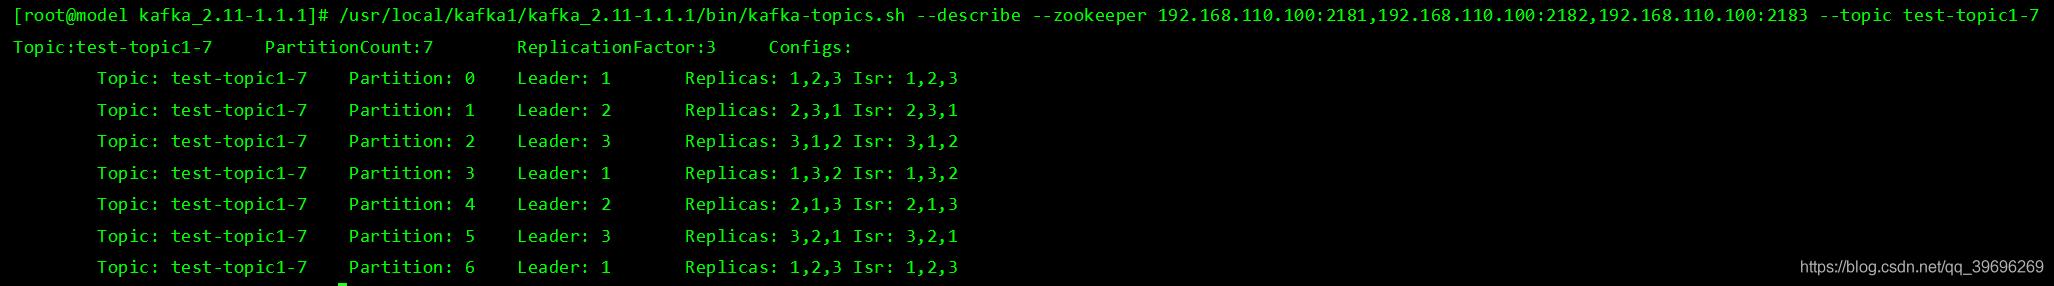 Linux配置Kafka集群(我的是在一台主机上配的)4